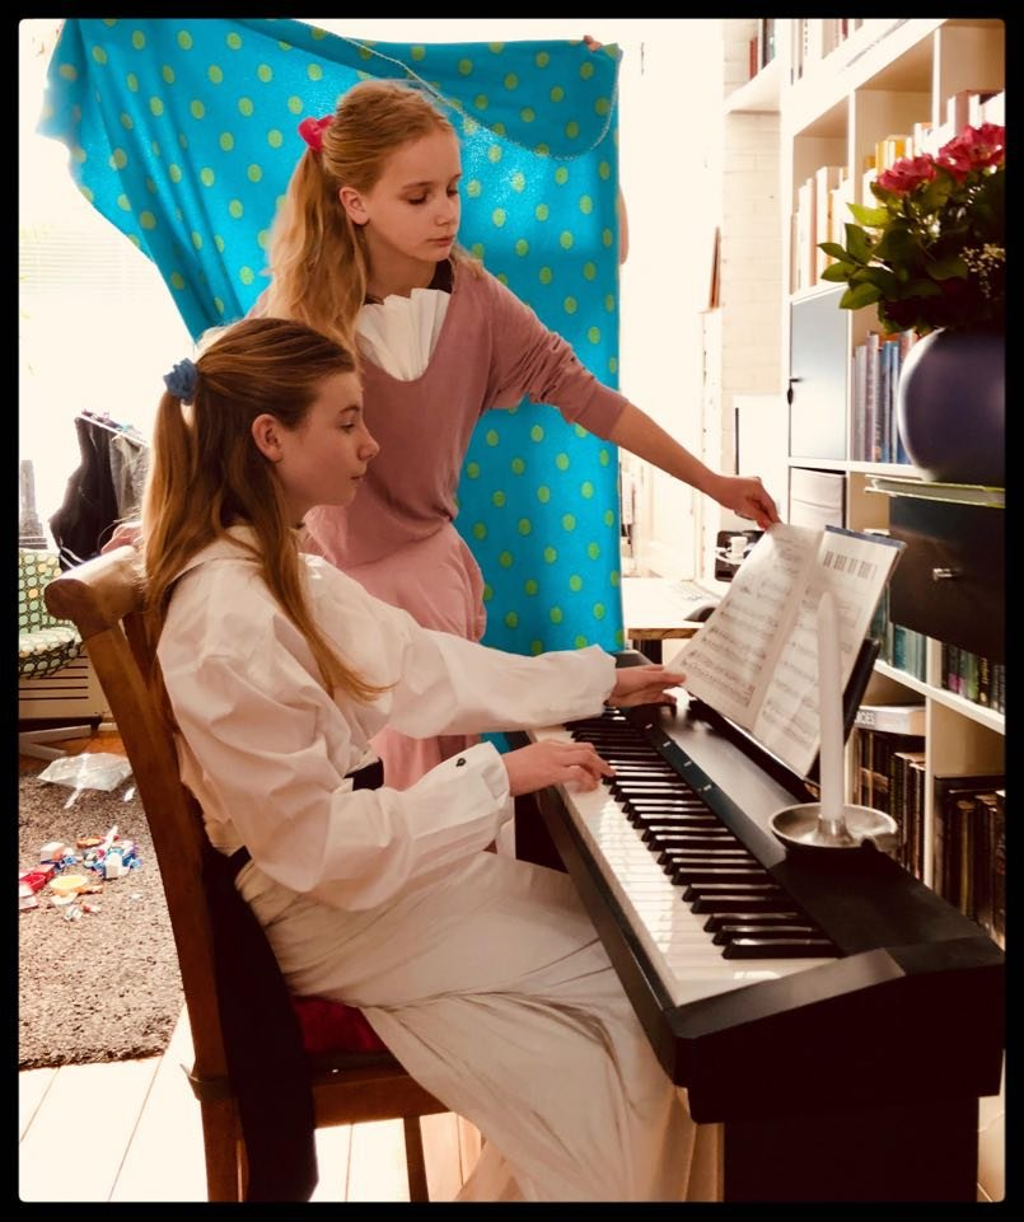 Jeunes filles au piano by gijsje